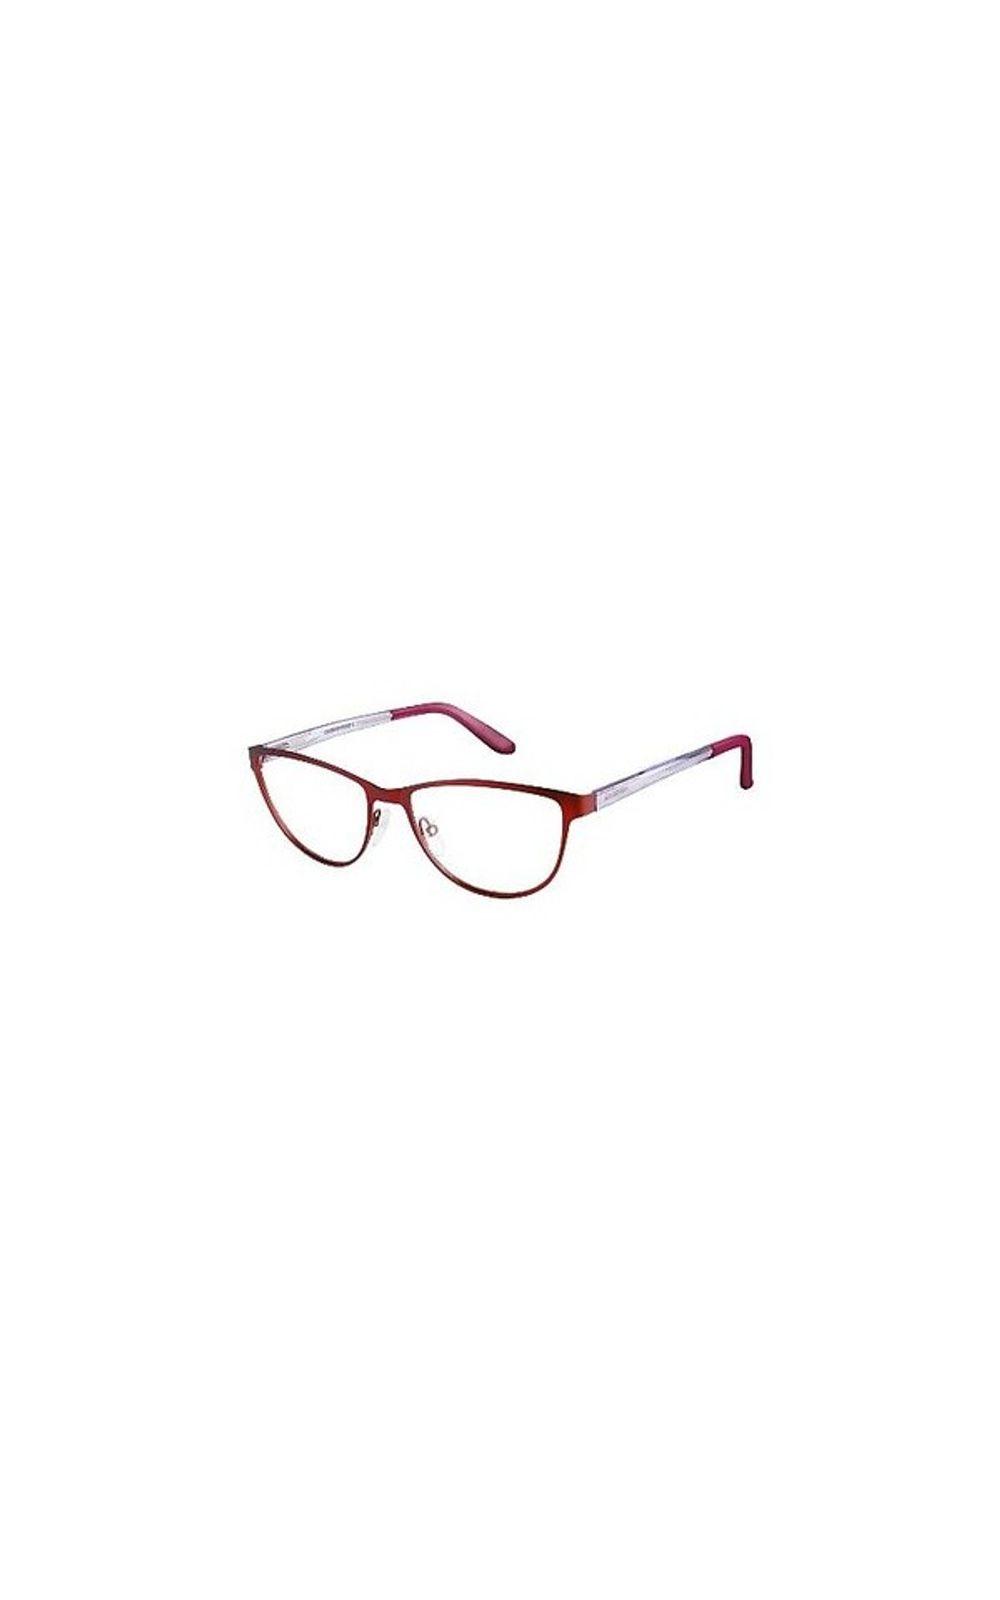 779500c6f Óculos de Grau Feminino Carrera 6651 SQW. undefined